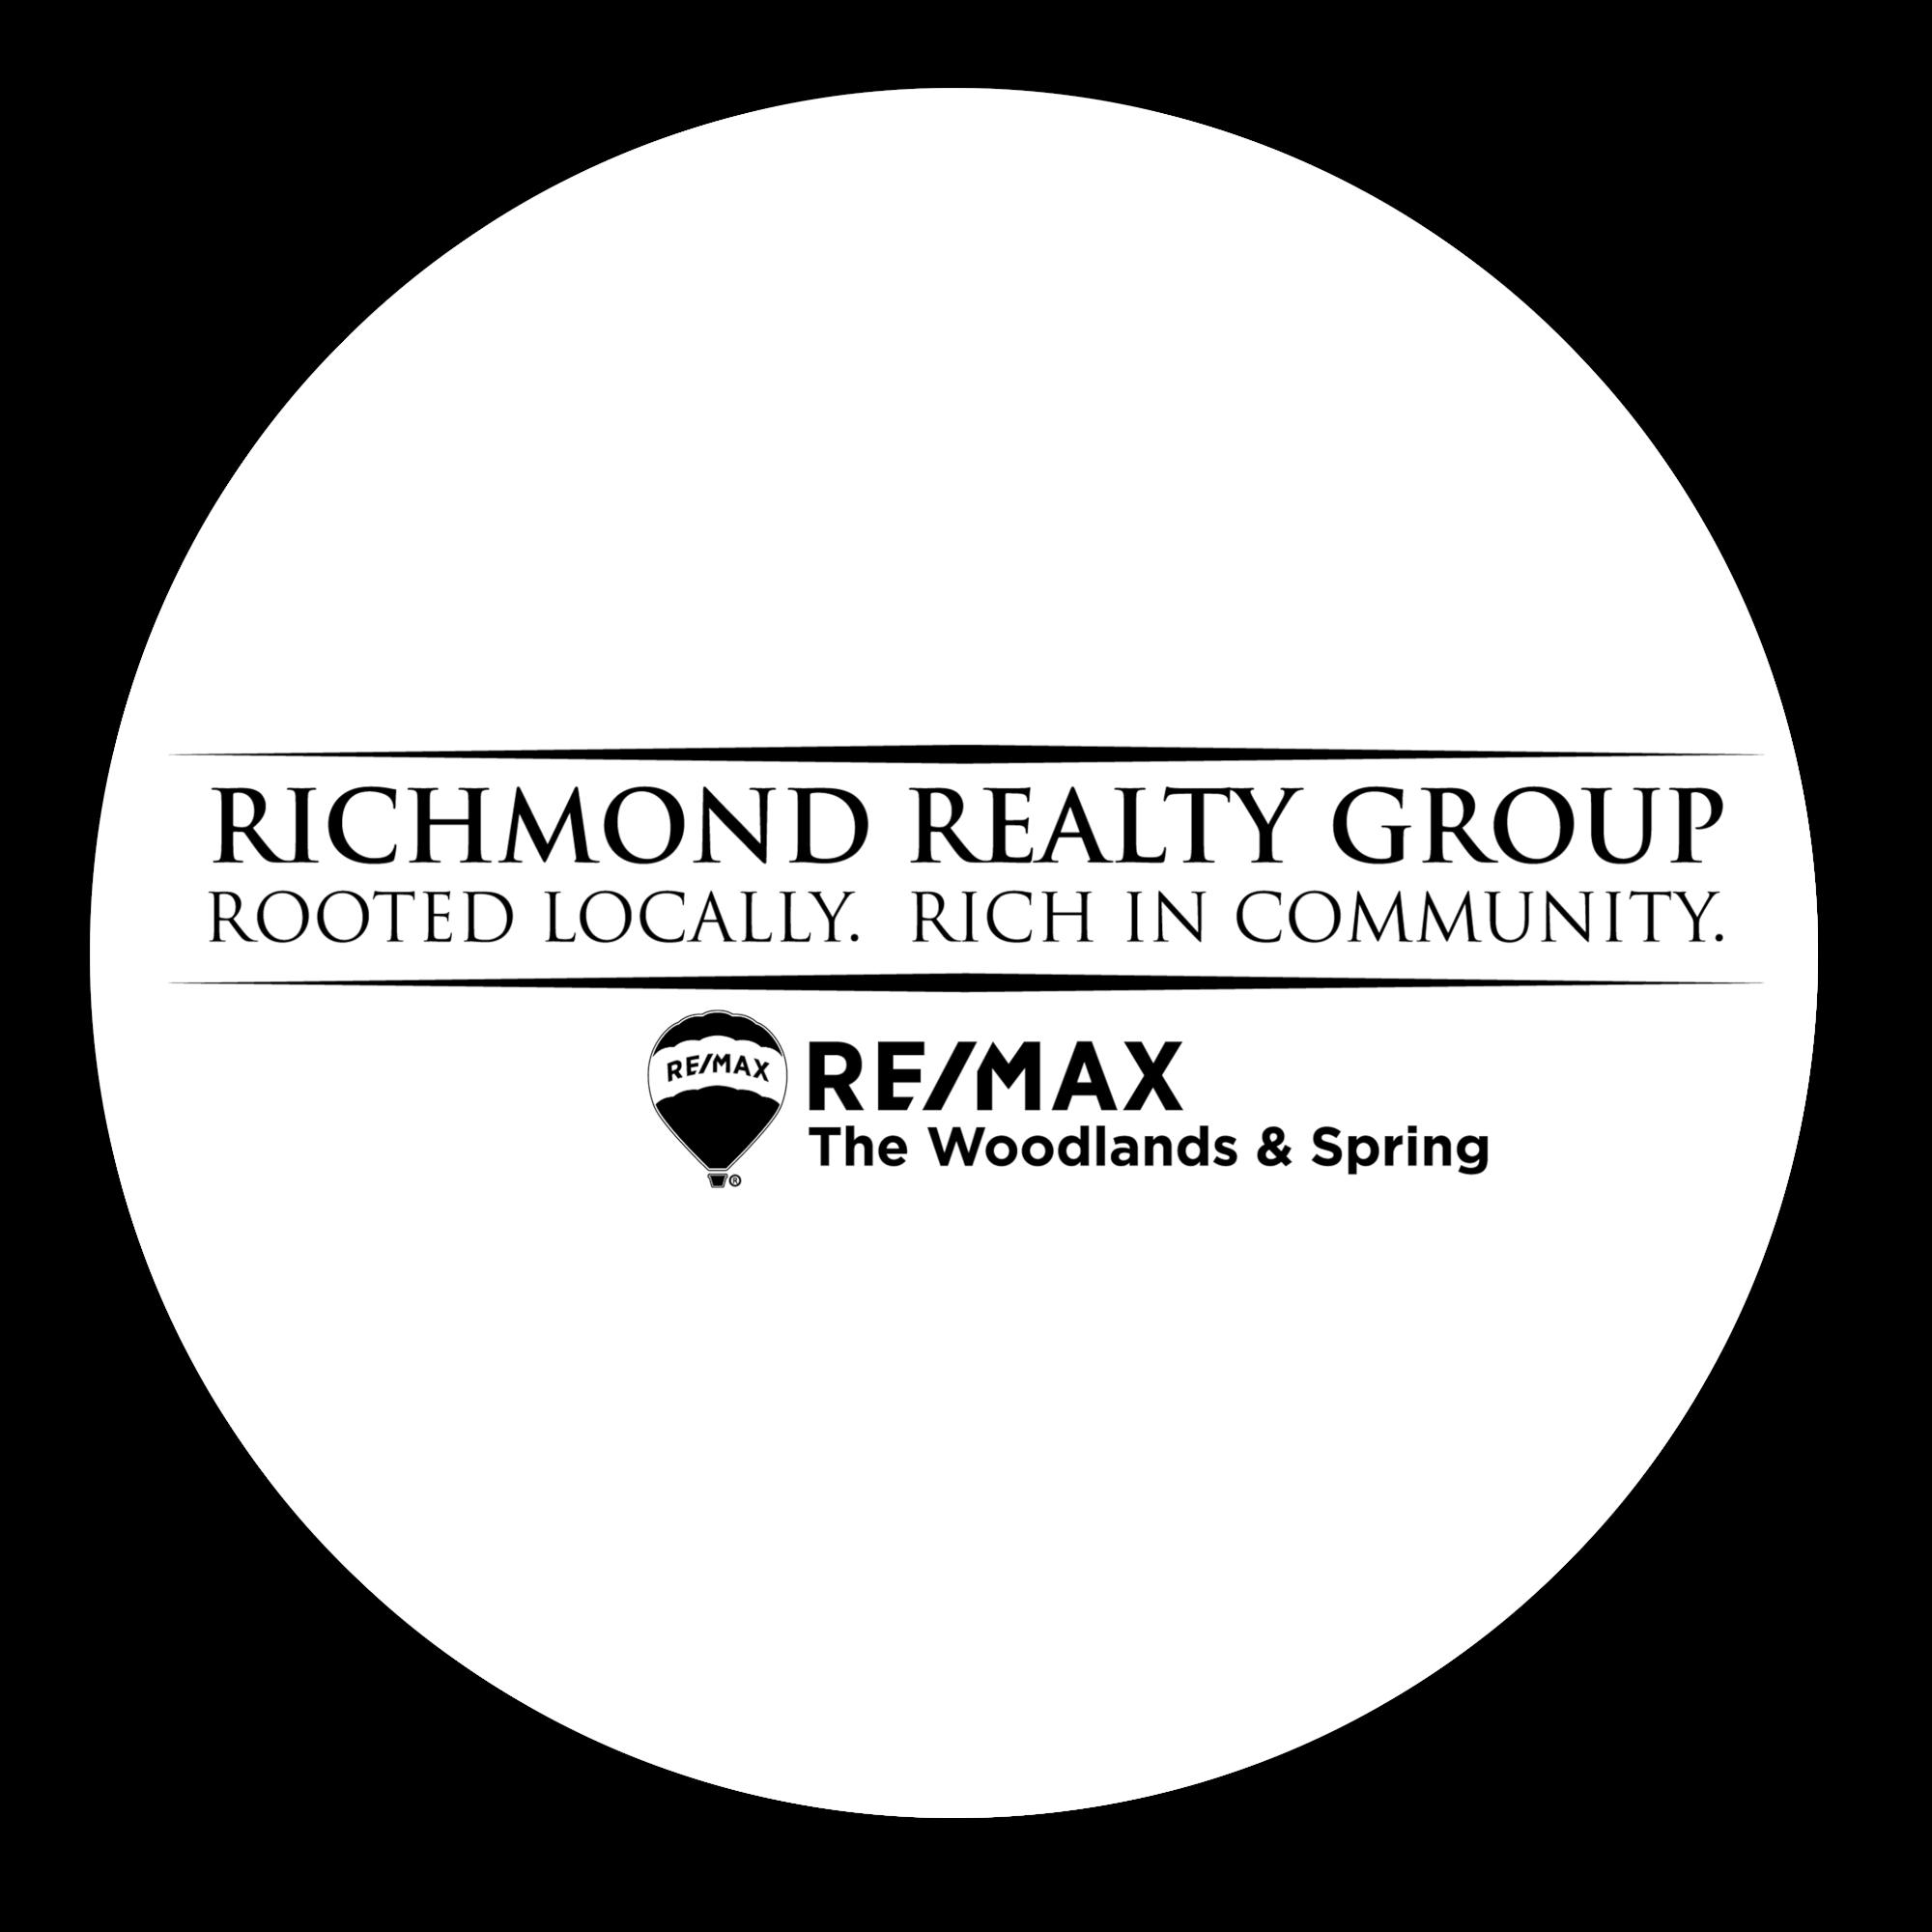 real estate marketing and logo design